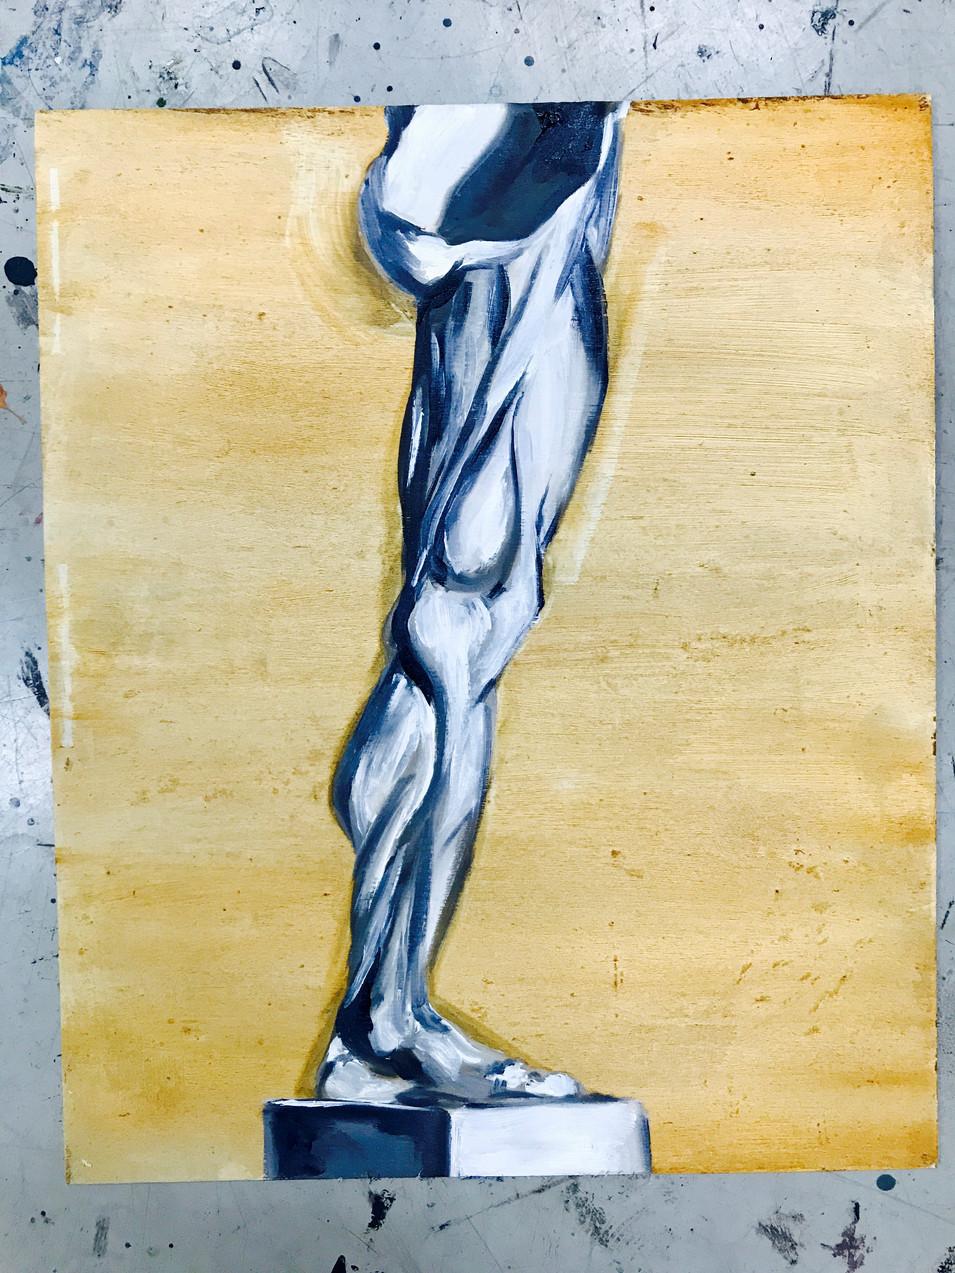 Study of the Leg